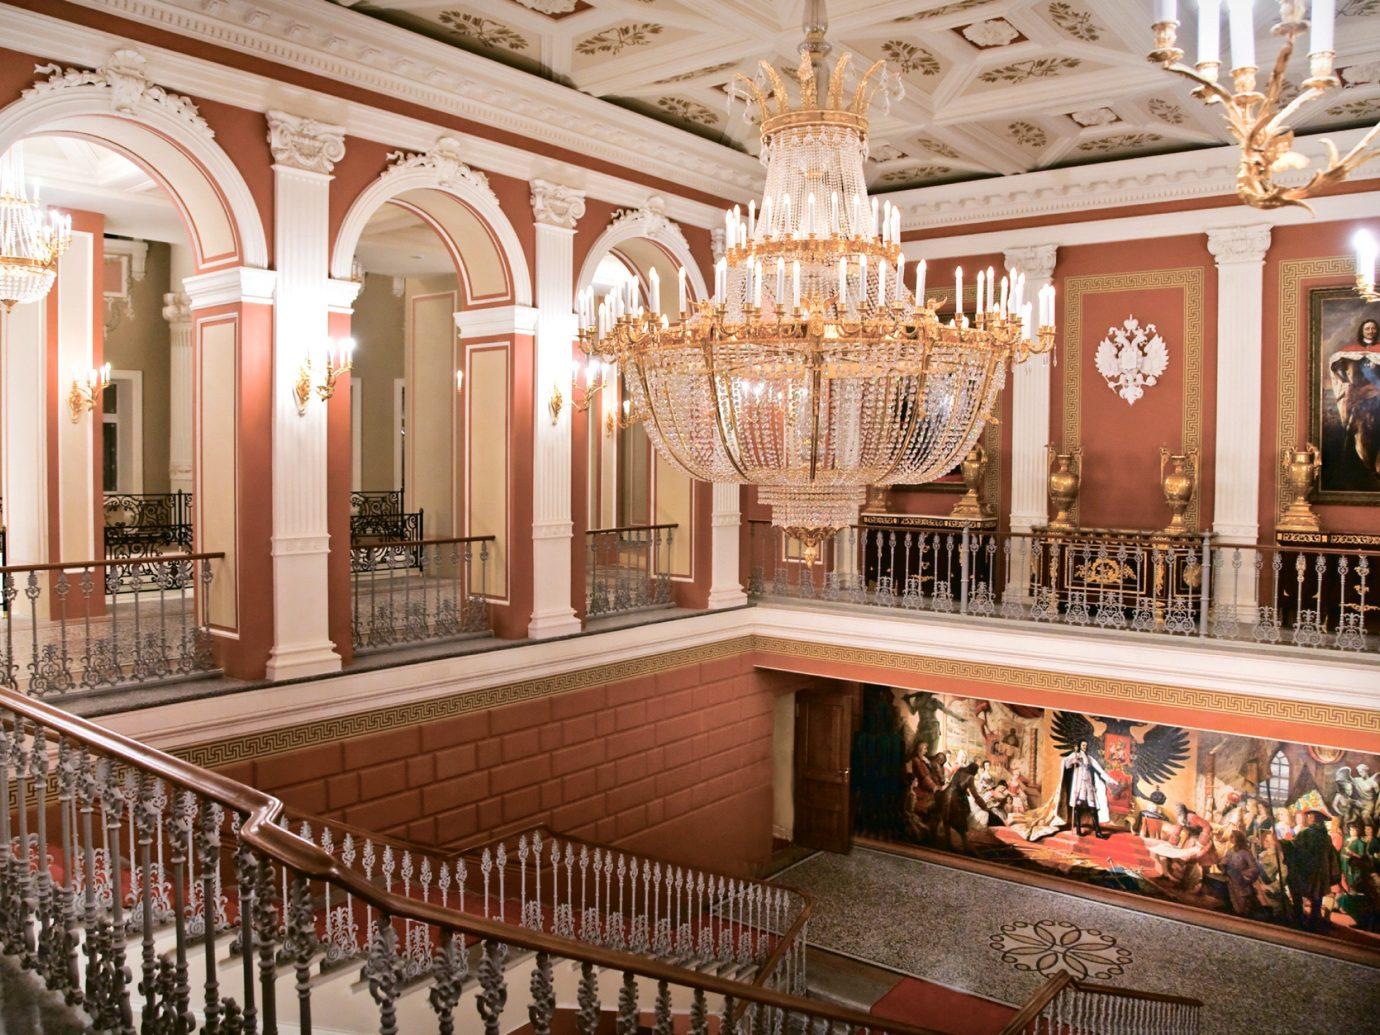 Design Elegant Hotels Luxury Travel Resort indoor building palace estate interior design chapel synagogue place of worship ballroom